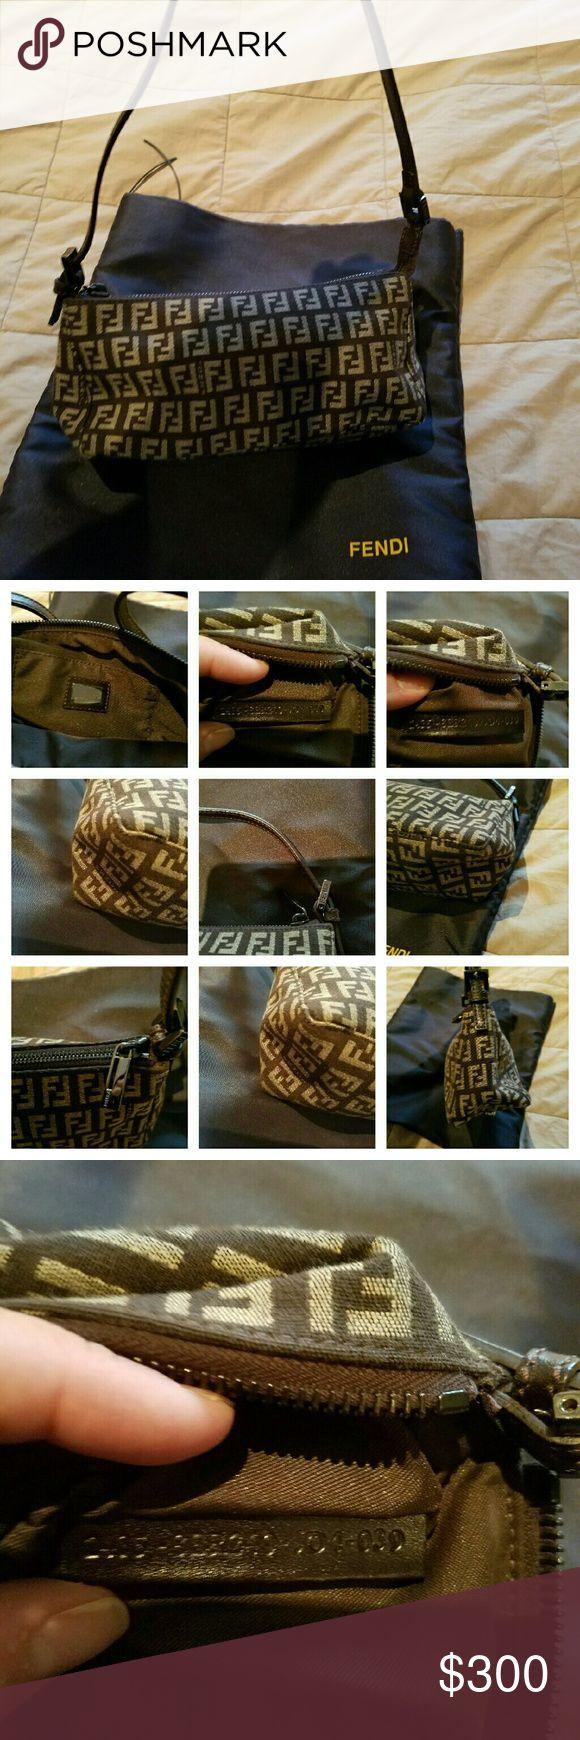 💯 authentic Fendi purse Brown fendi purse excellent condition no flaws no smells.rips.. fendi  Accessories